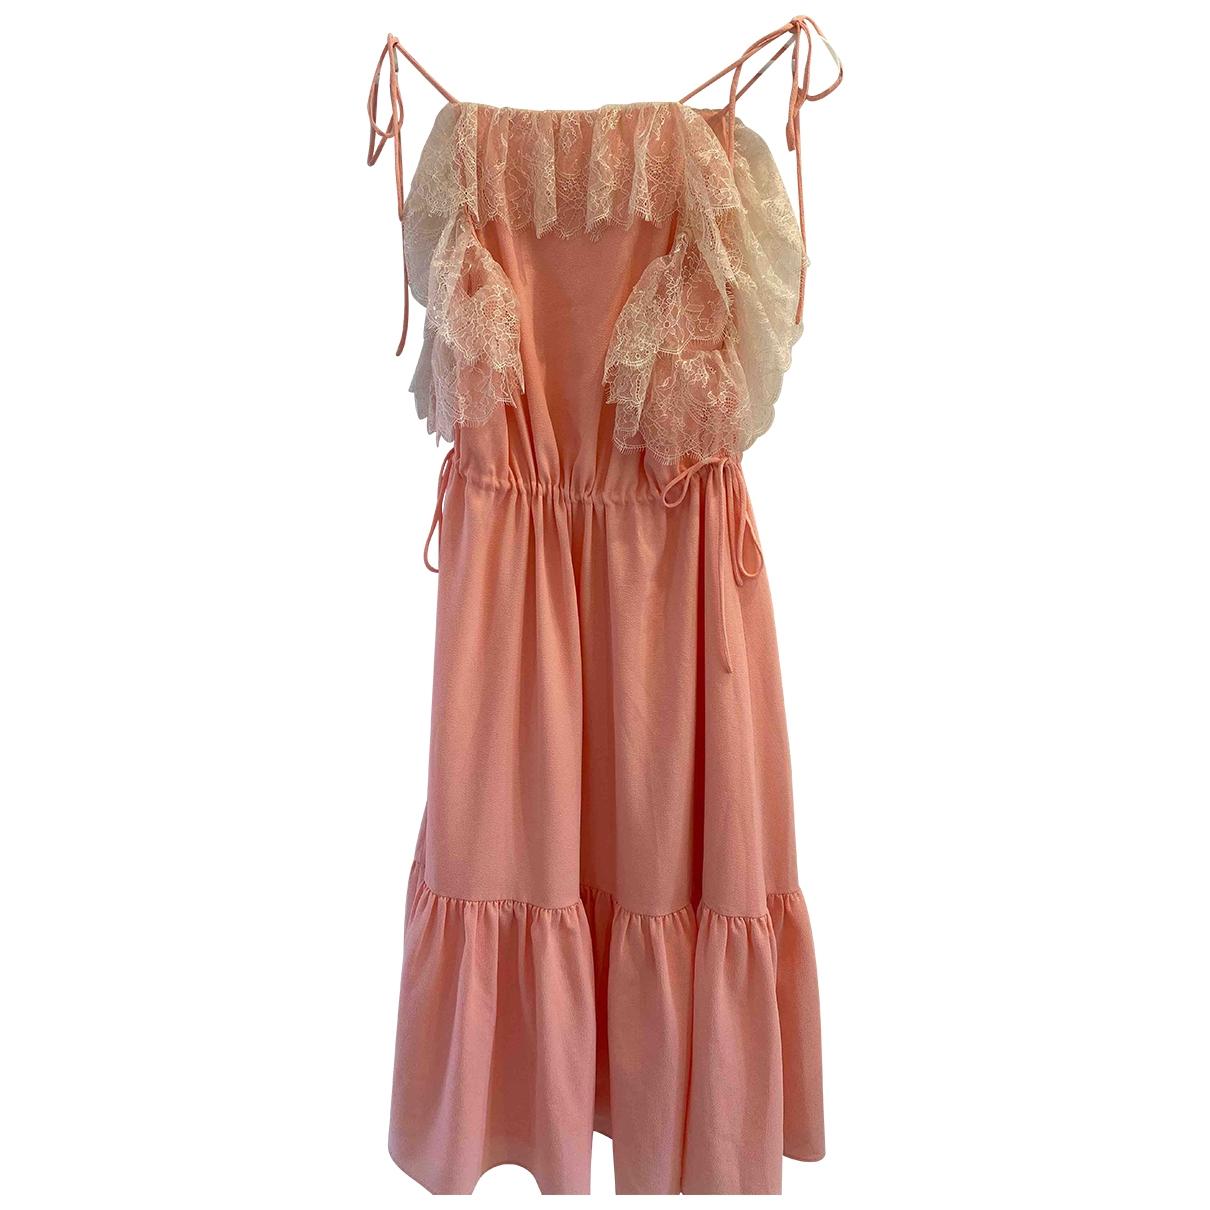 Claudie Pierlot \N Pink dress for Women 40 FR